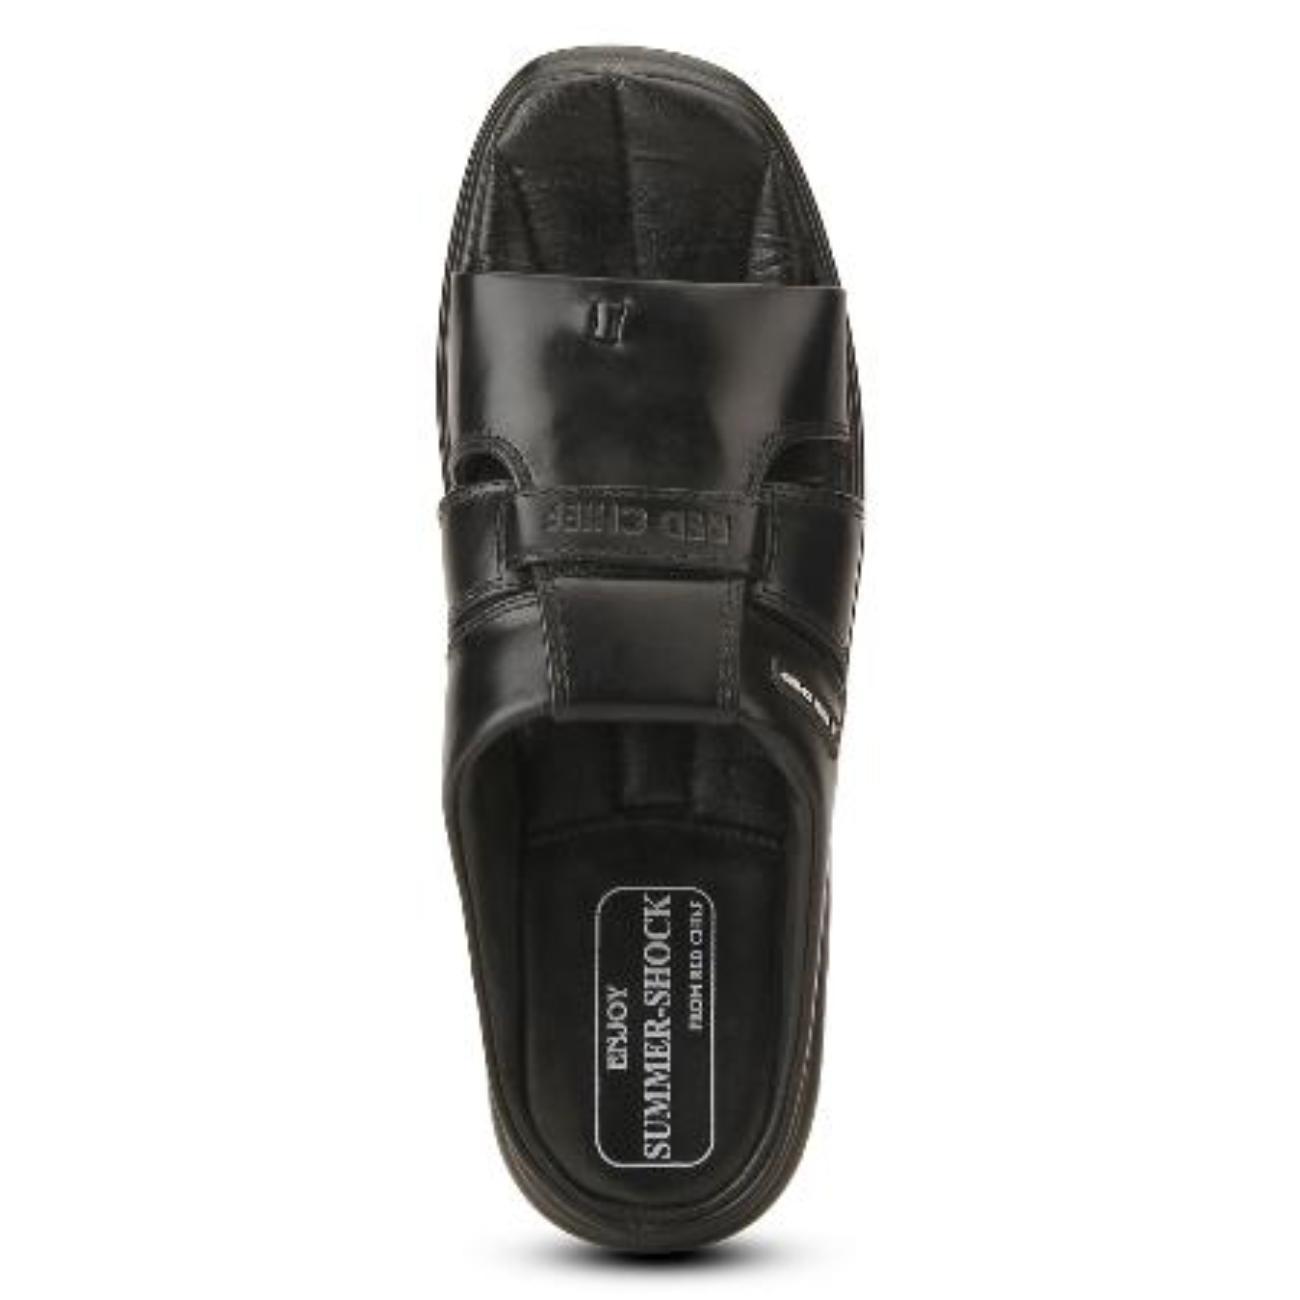 black slip-on slippers top view